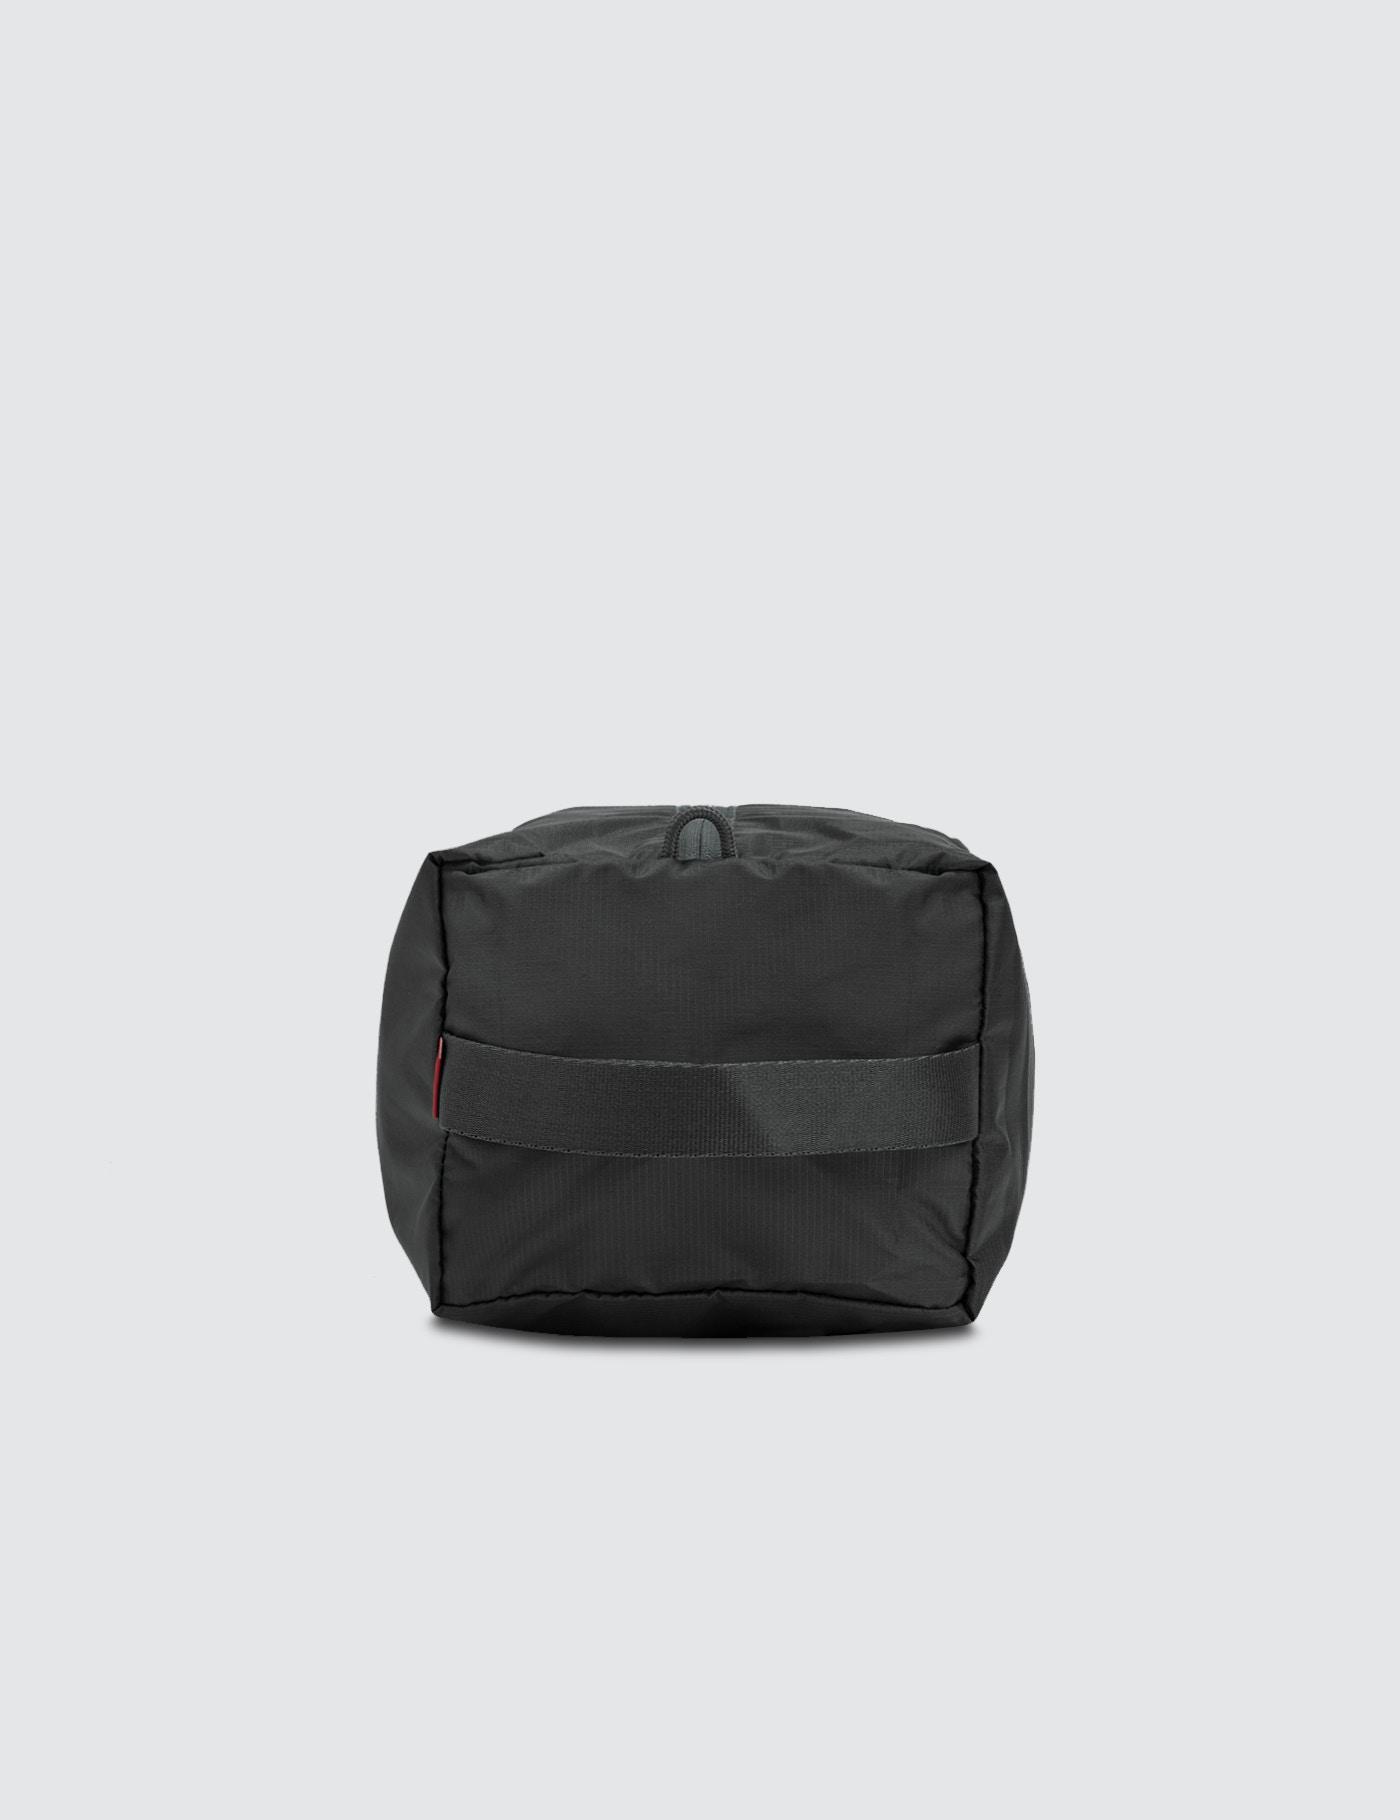 03defb3e2b5 Lyst - Herschel Supply Co. Wtaps X W-382 Toiletry Bag in Black for Men